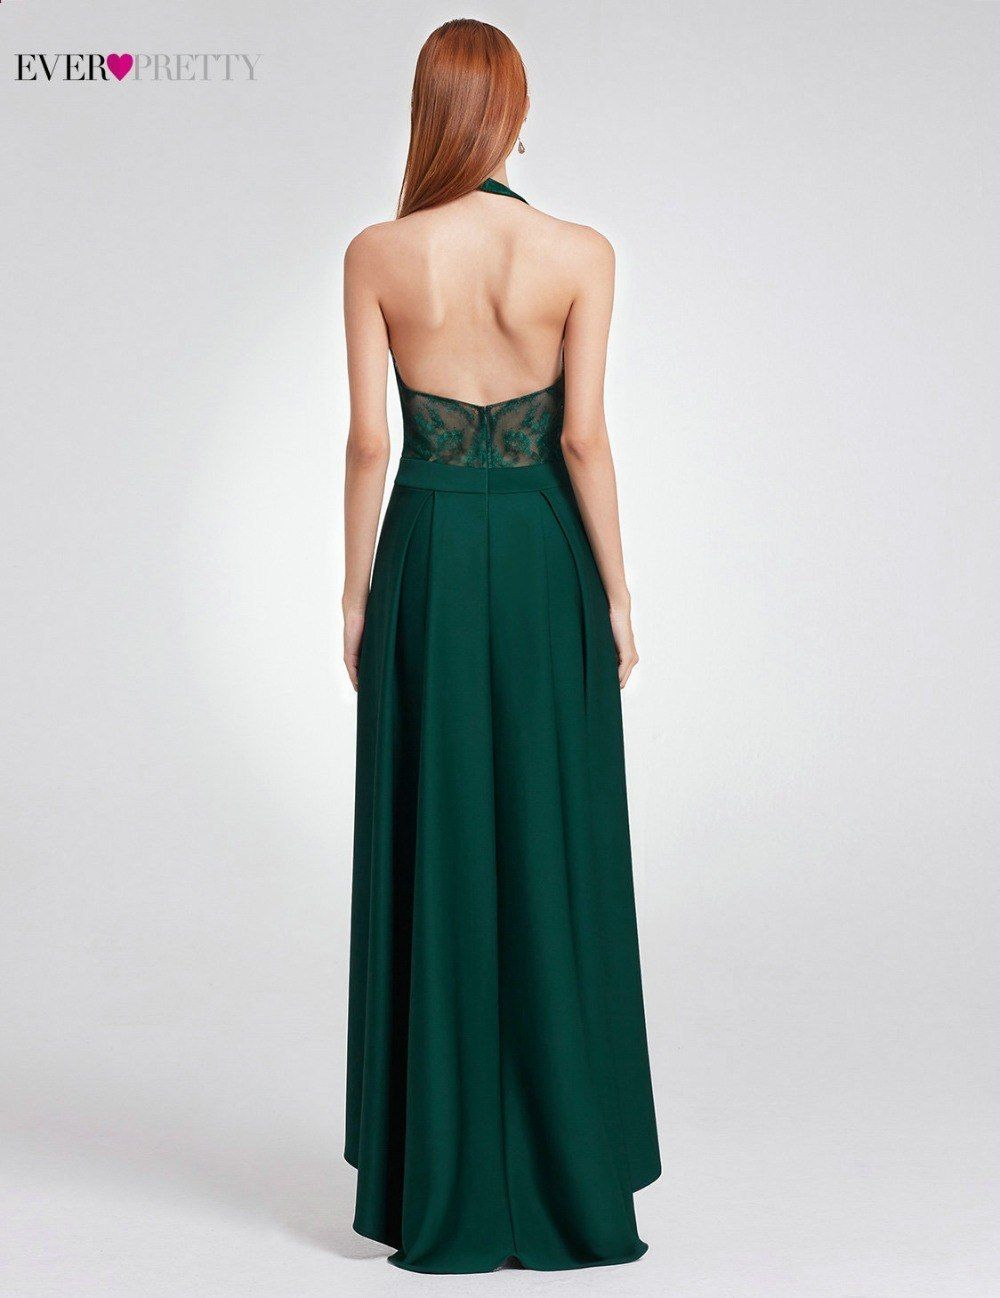 31b7c781d8d Dark Green Prom Dresses 2018 Halter Backless Ever Pretty Brand Illusion  Elegant Women Ladies High Low Dresses For Wedding Party